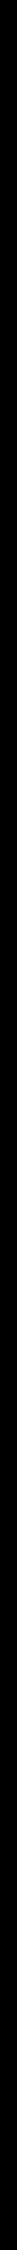 black copy 8.jpg